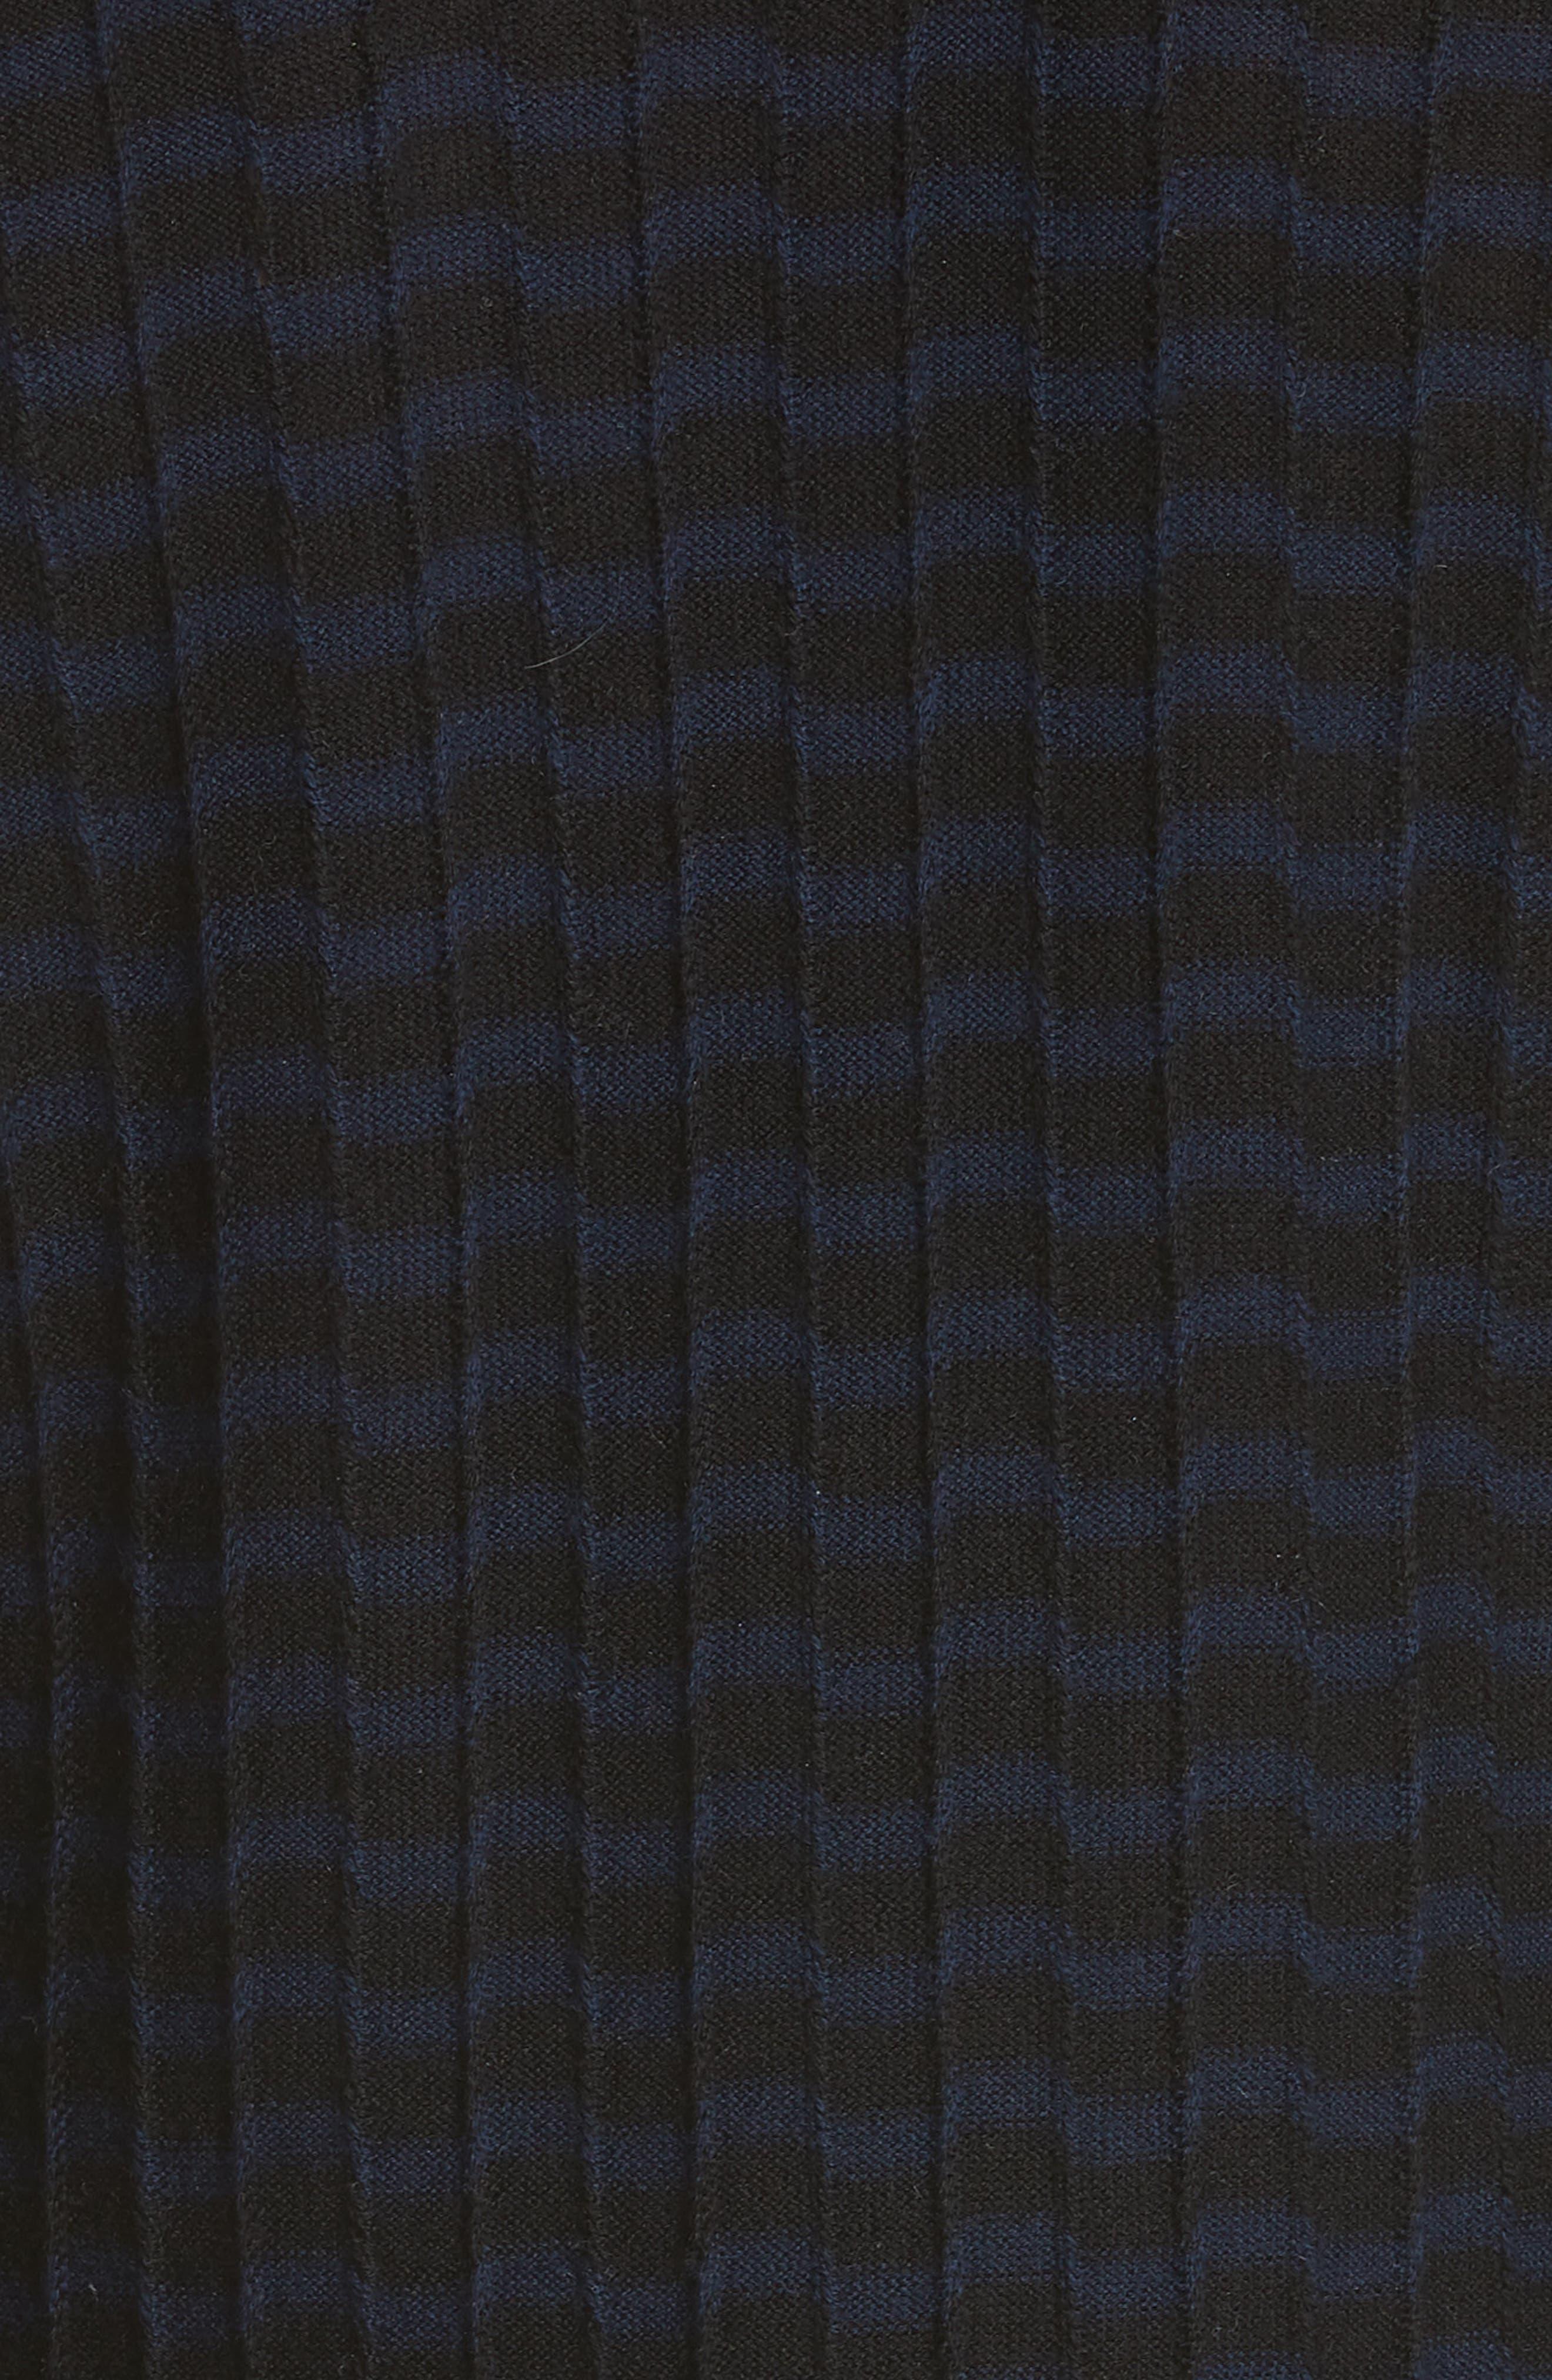 Stripe Wool Sweater-Dress,                             Alternate thumbnail 6, color,                             400